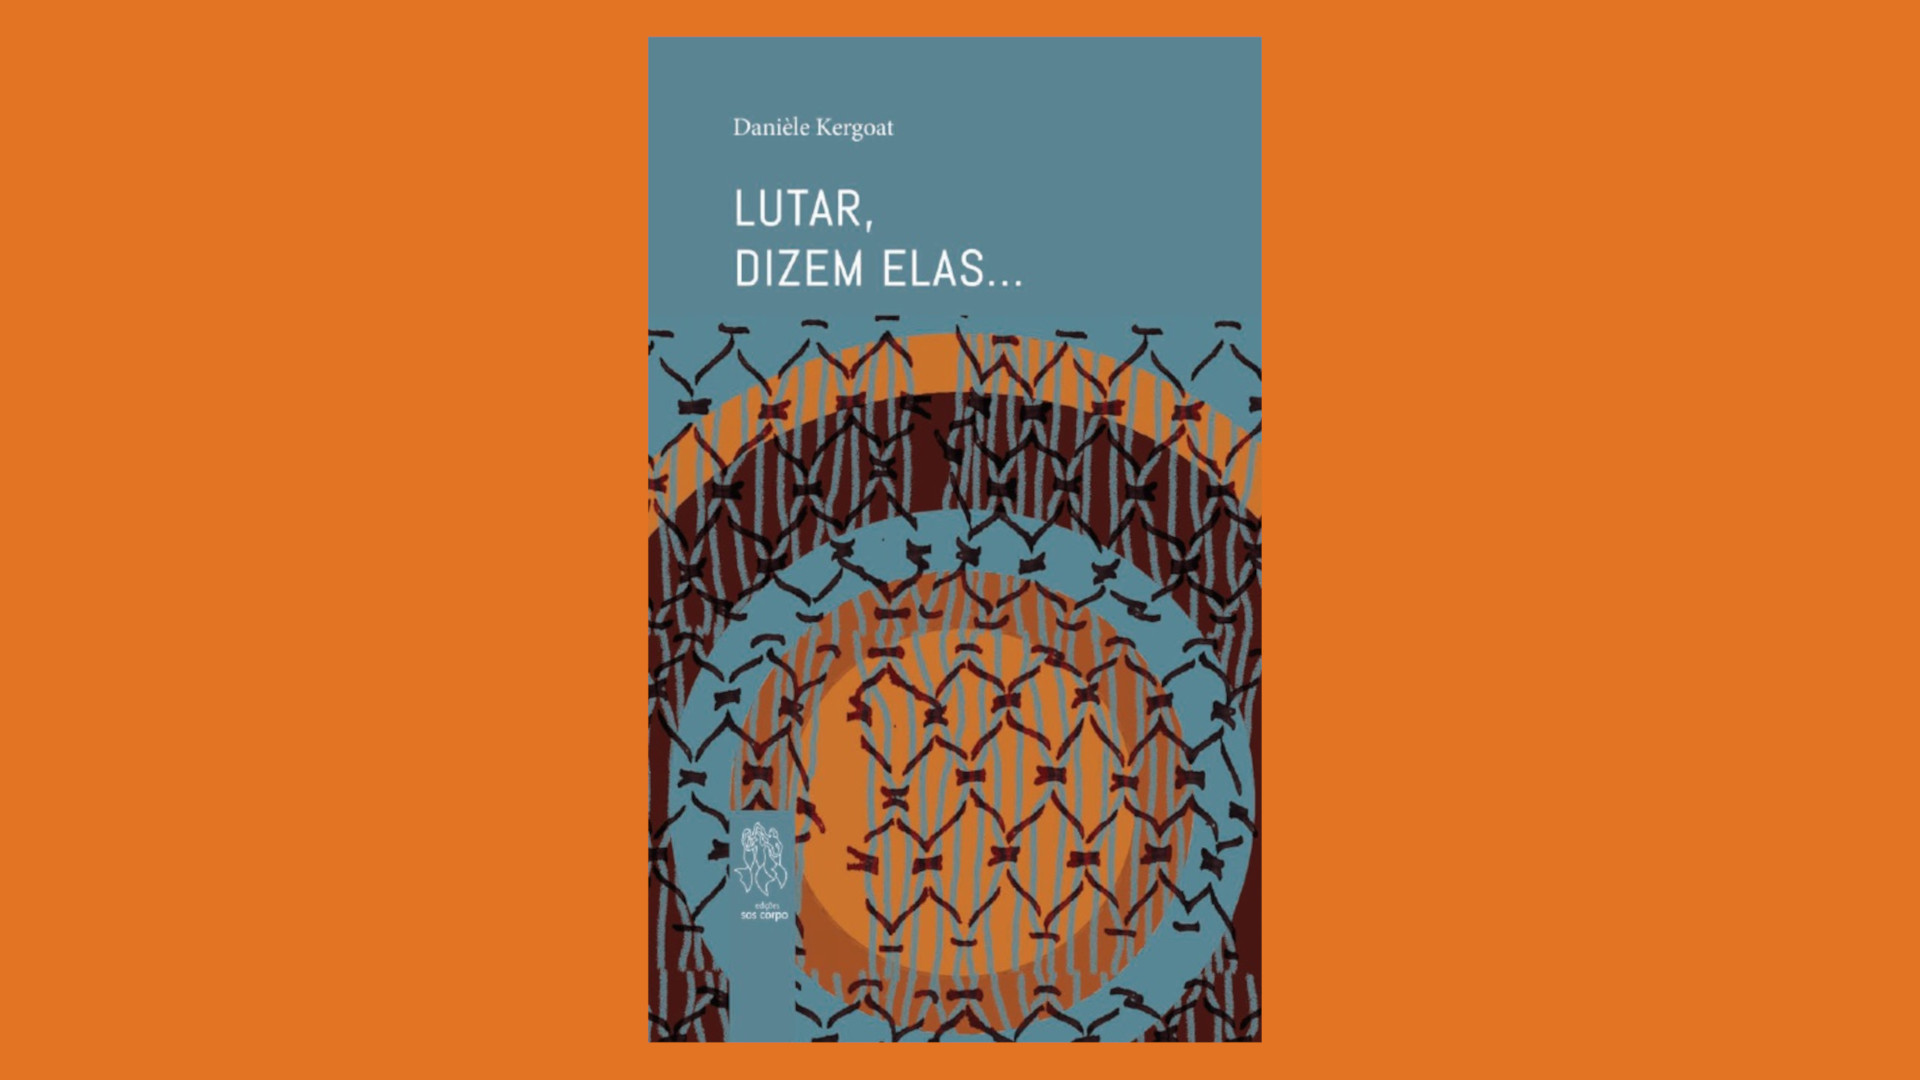 [Livro] Lutar, Dizem Elas… de Danièle Kergoat disponível para download